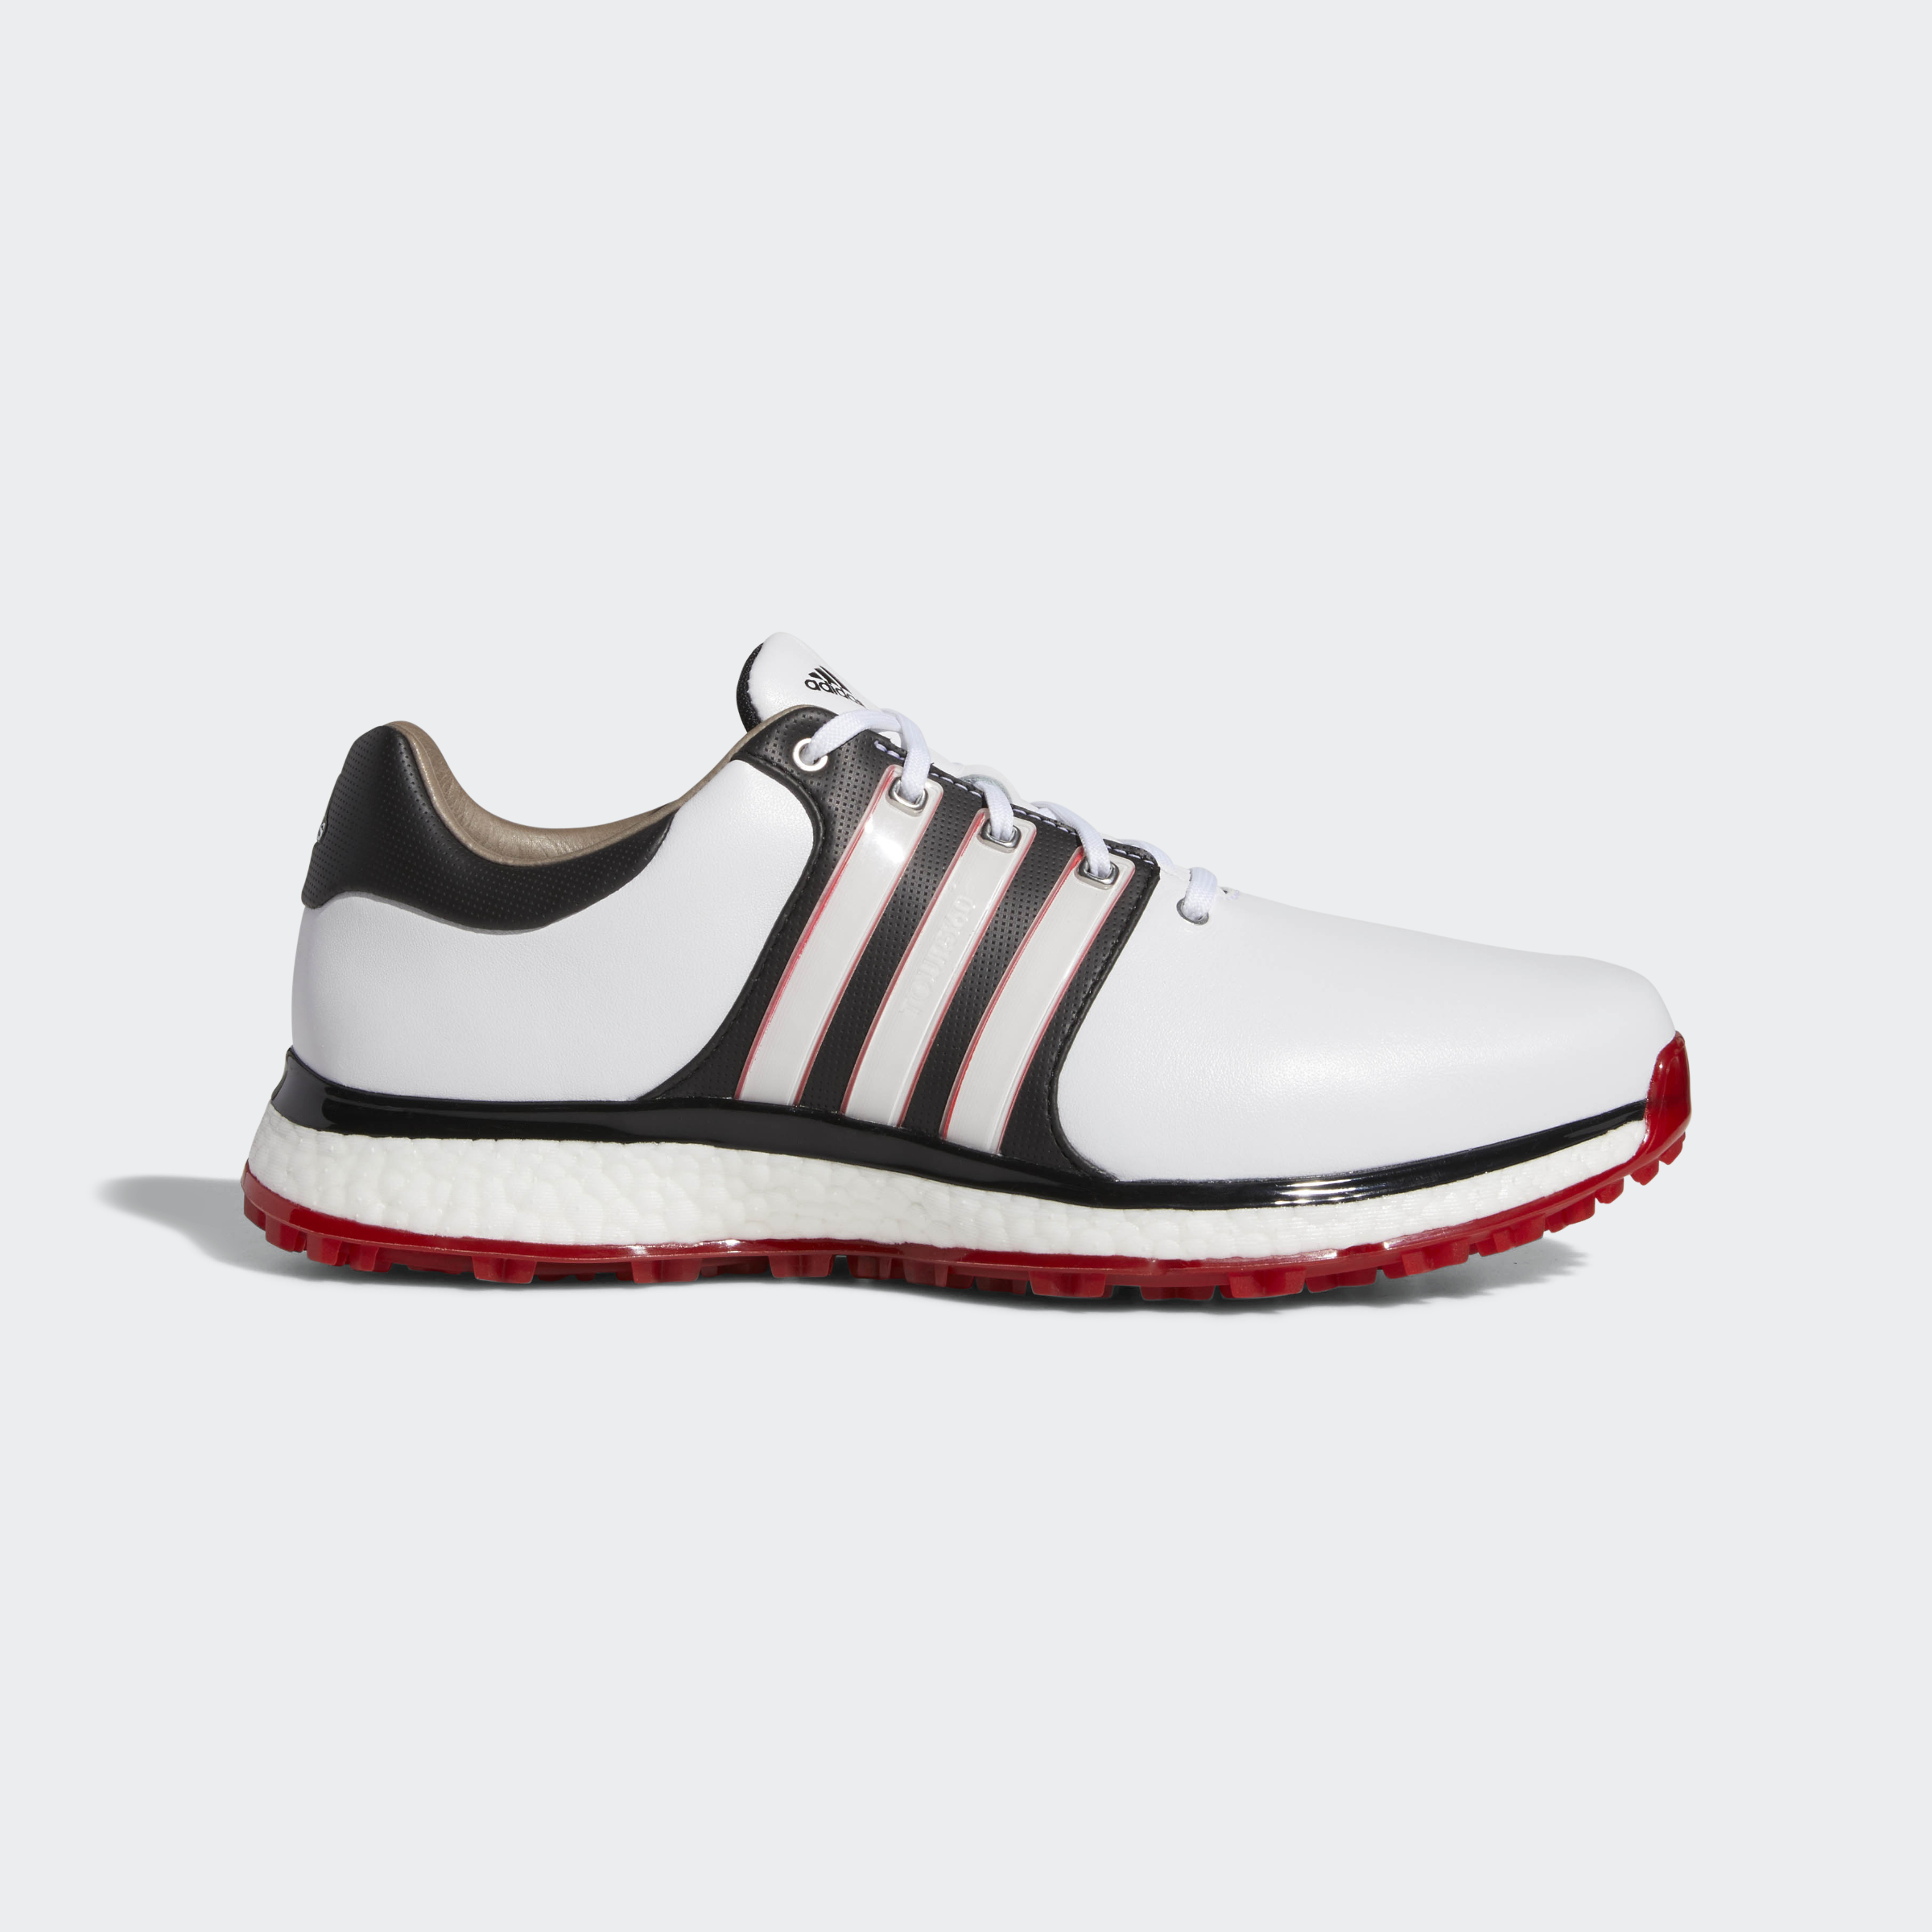 0387d088024 Golf Shoes for Men